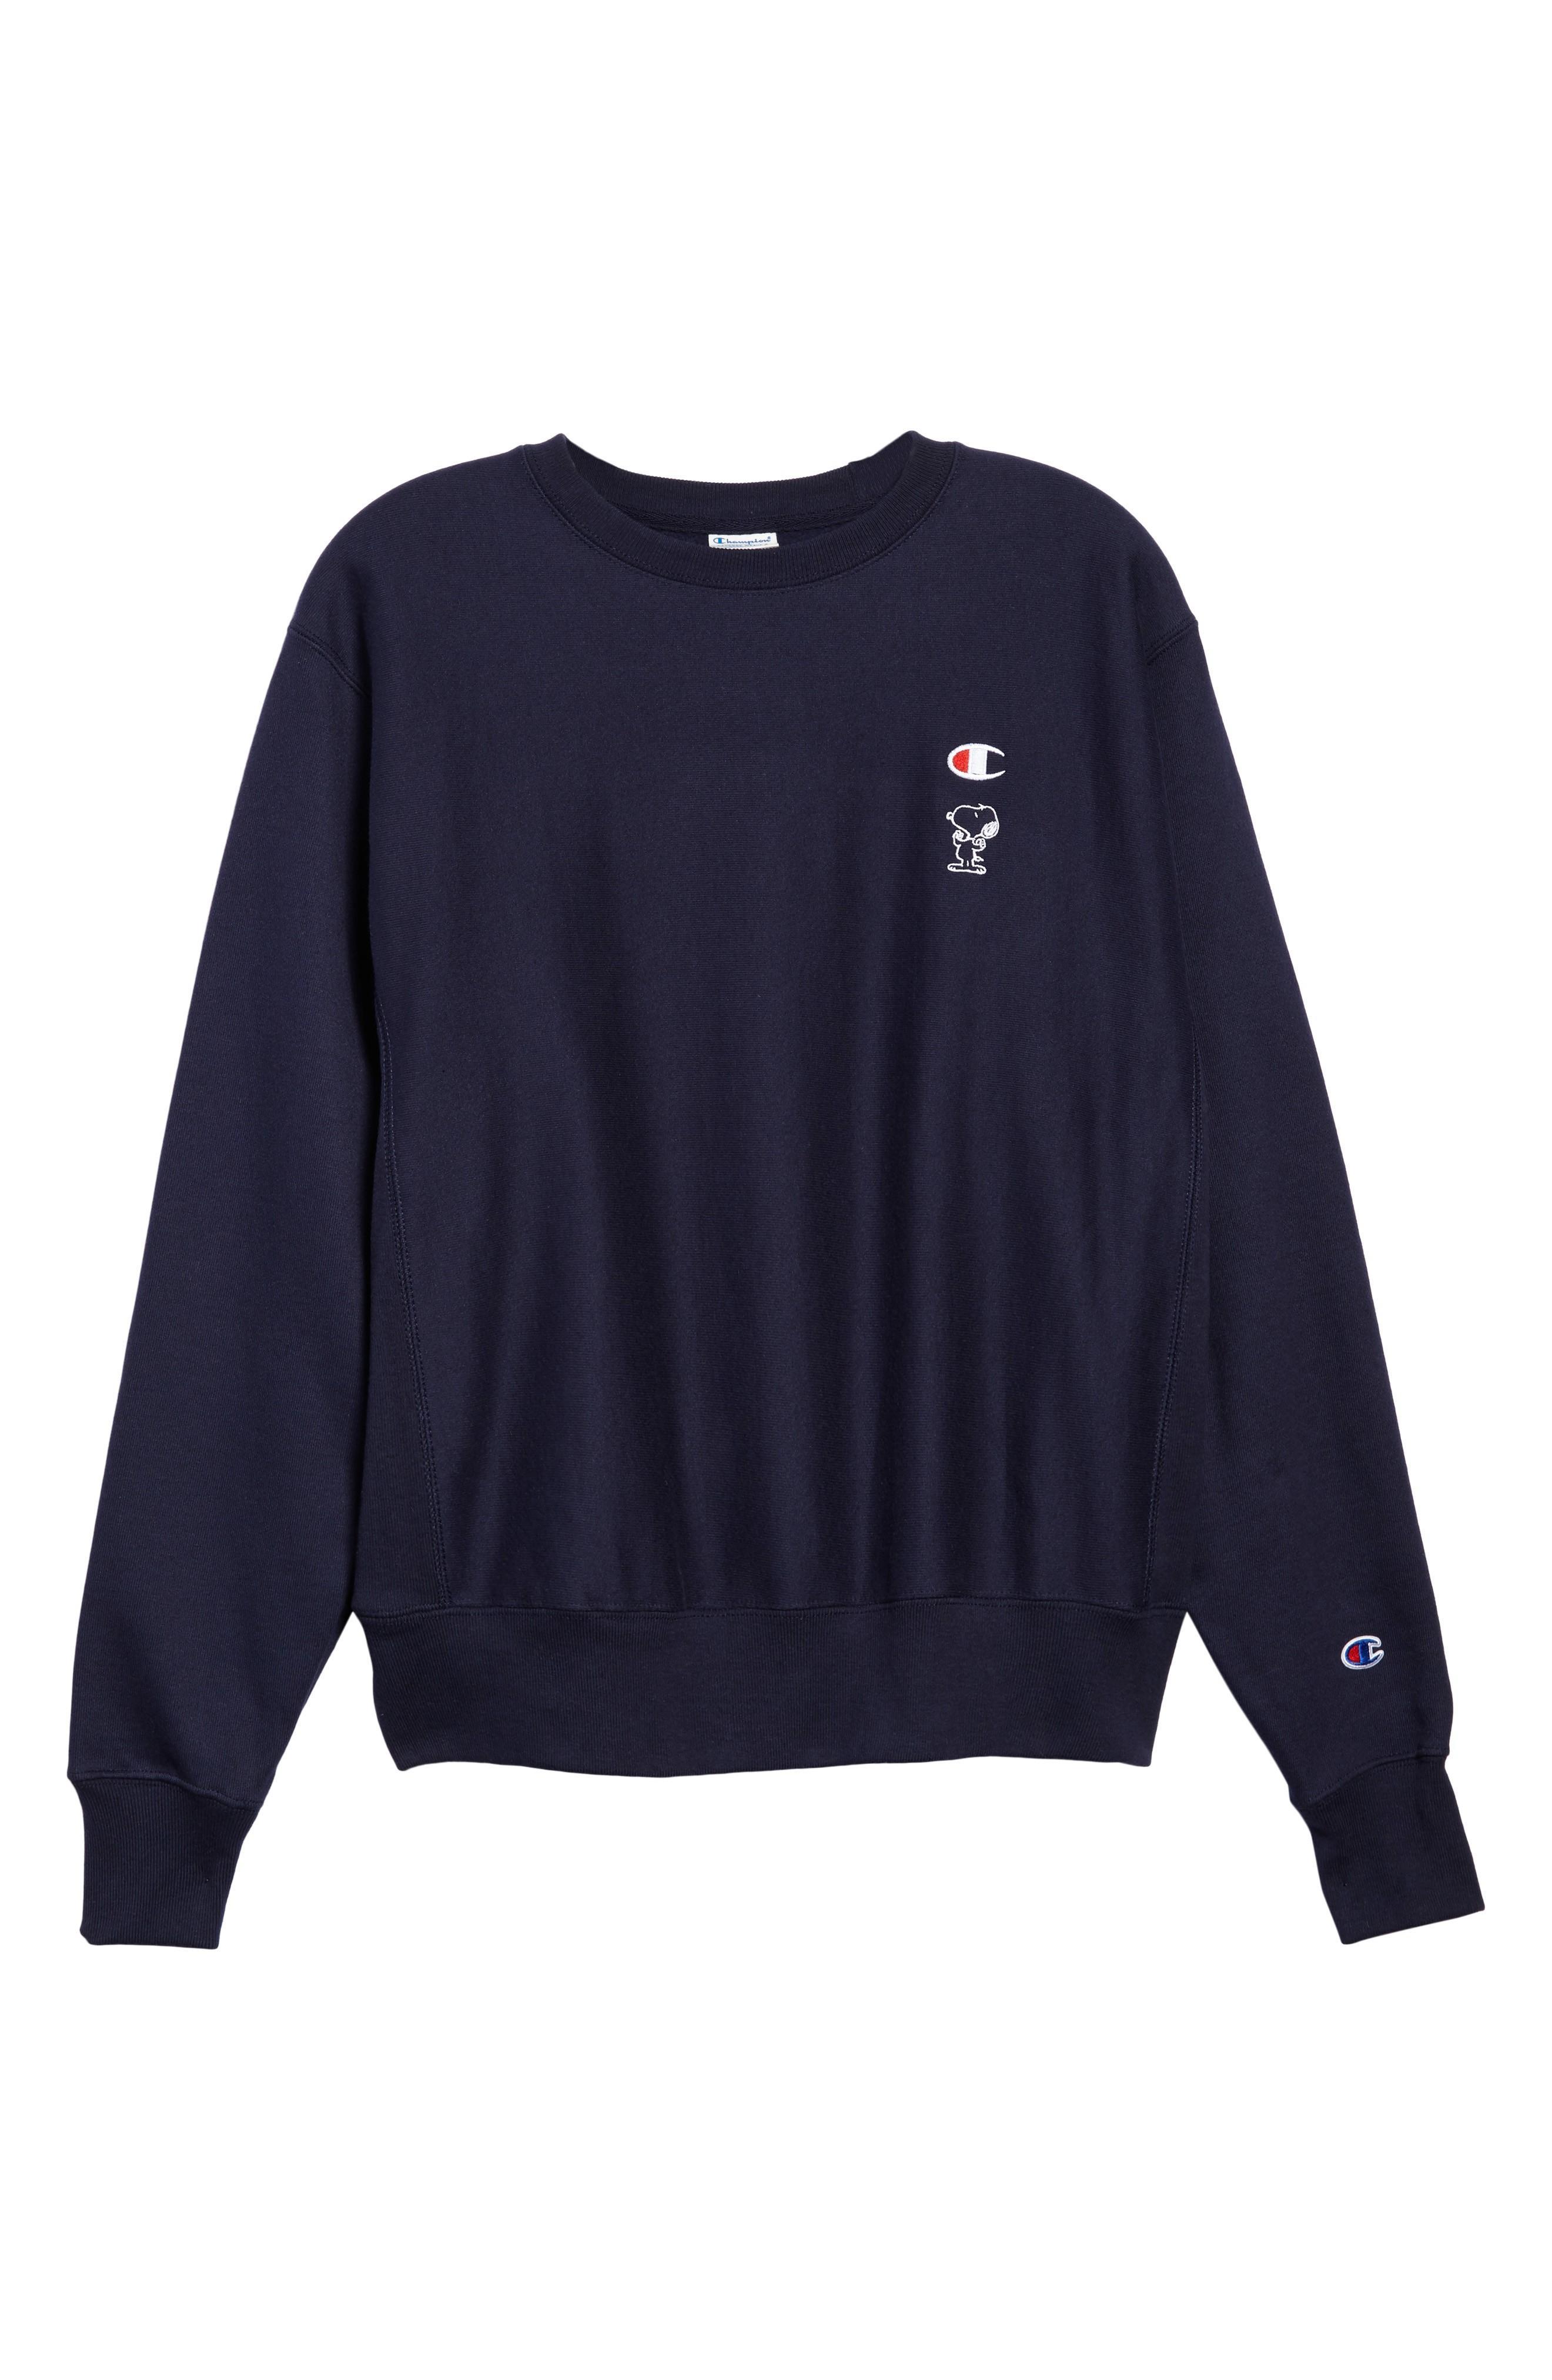 Champion Snoopy Unisex Sweatshirt In Navy